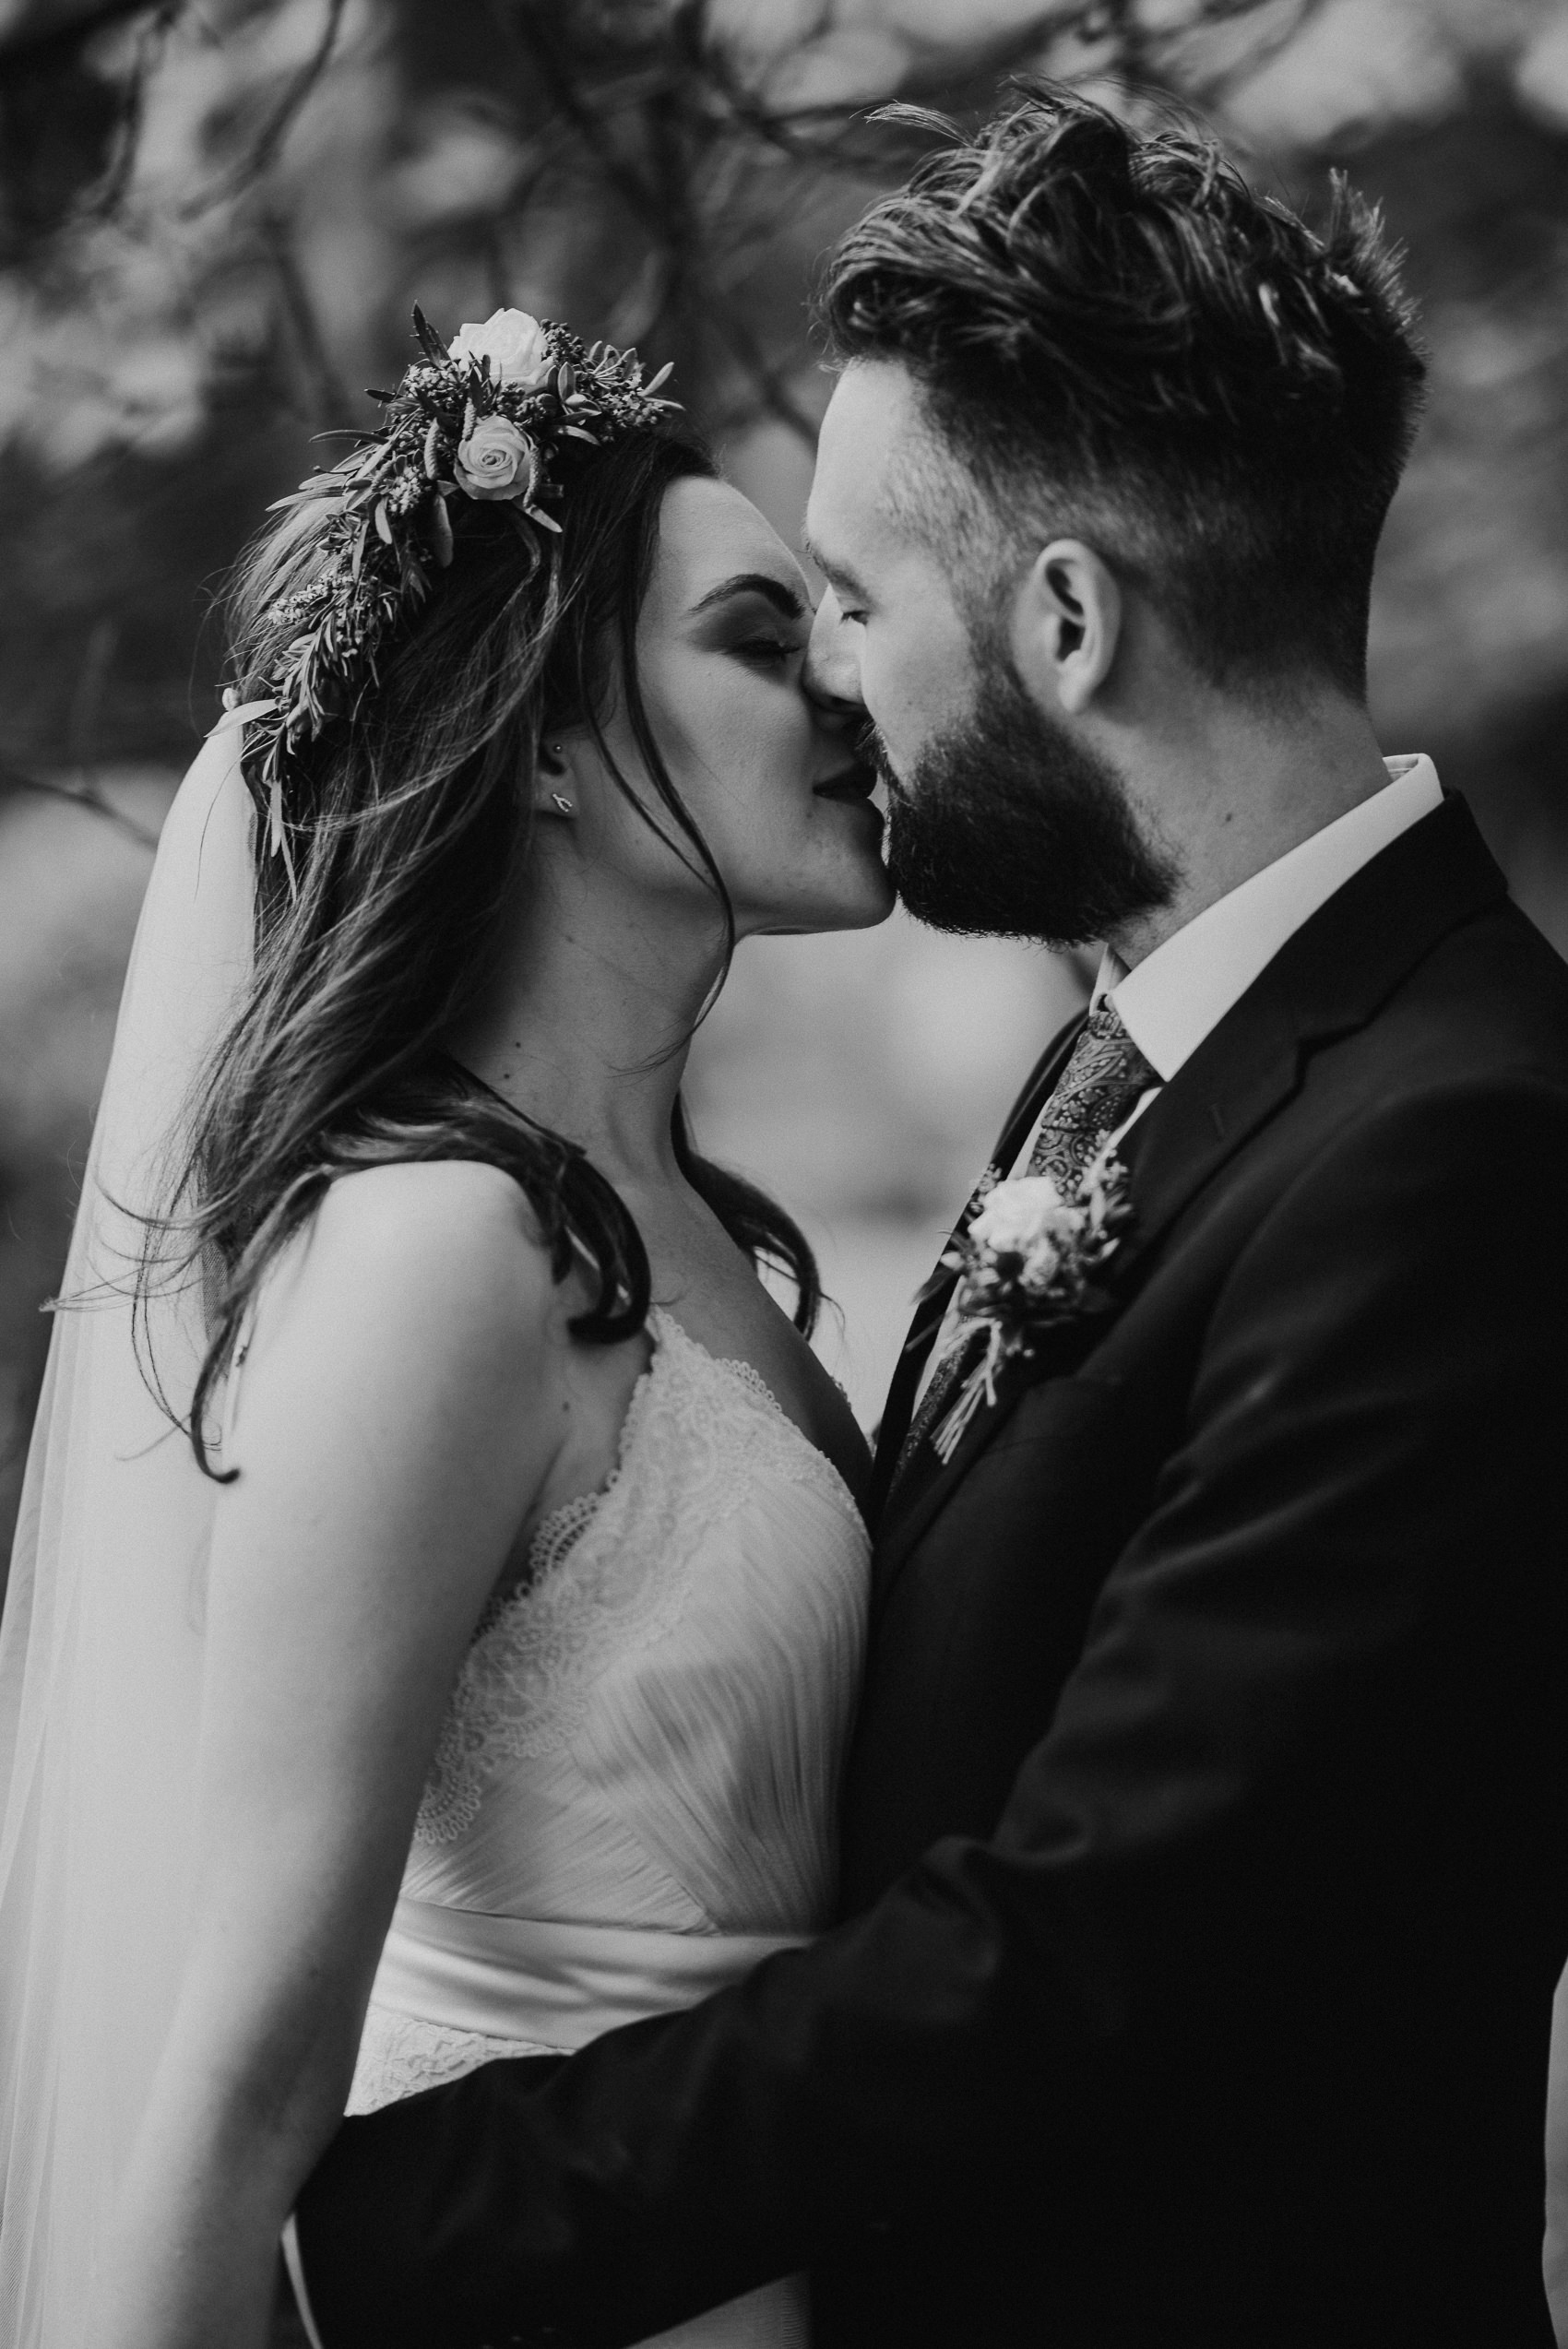 Photography by Ciara - wedding photographer 14